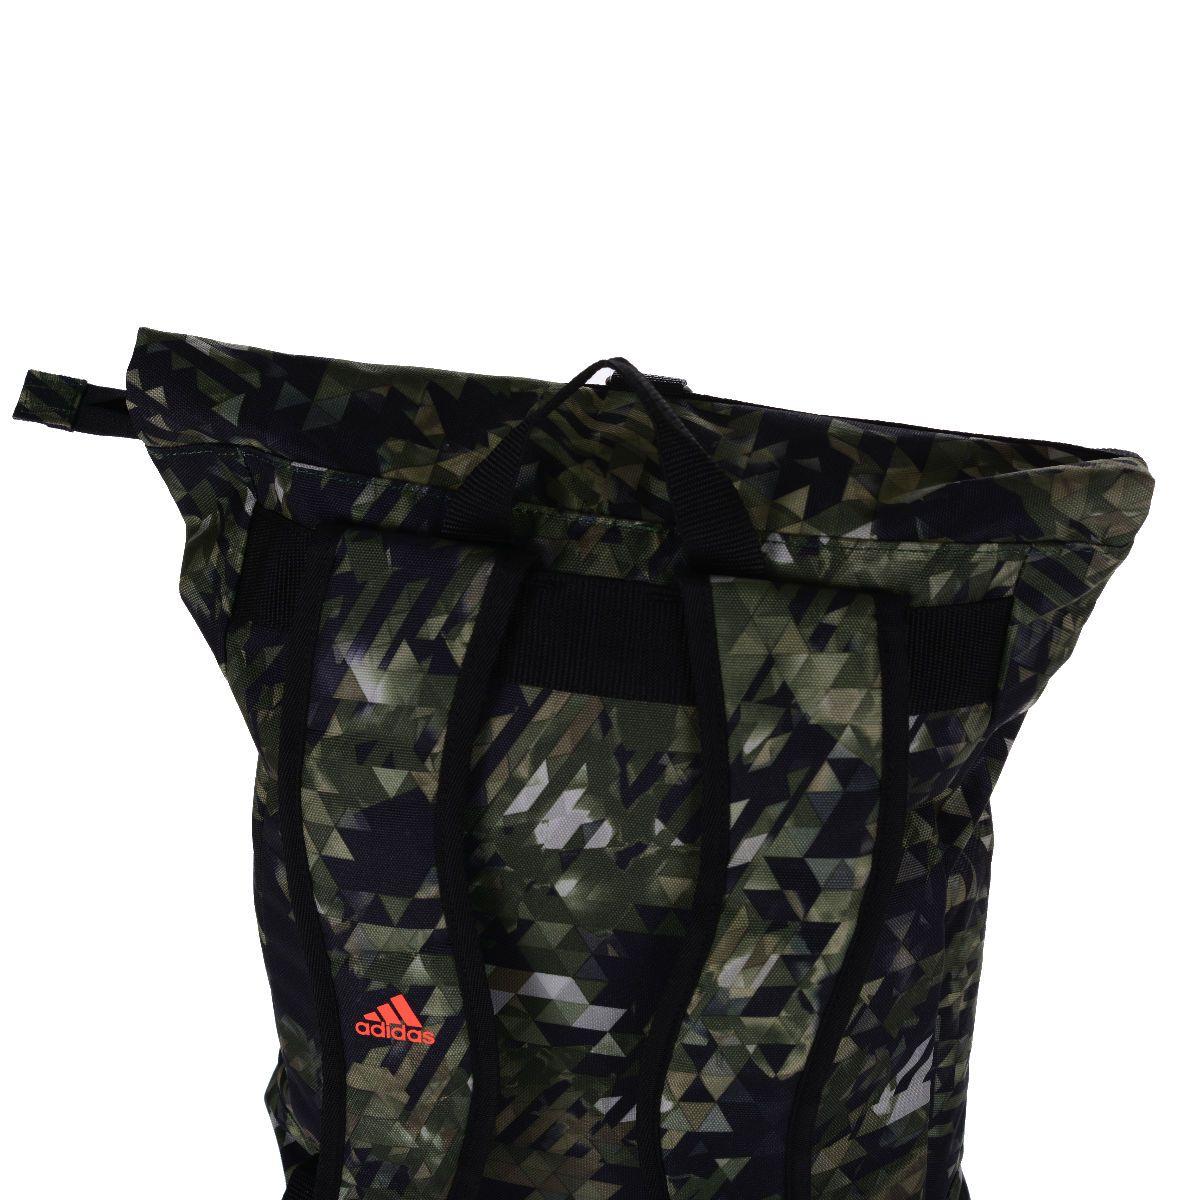 Mochila adidas Karate Camuflada Verde/Laranja - 10 Litros